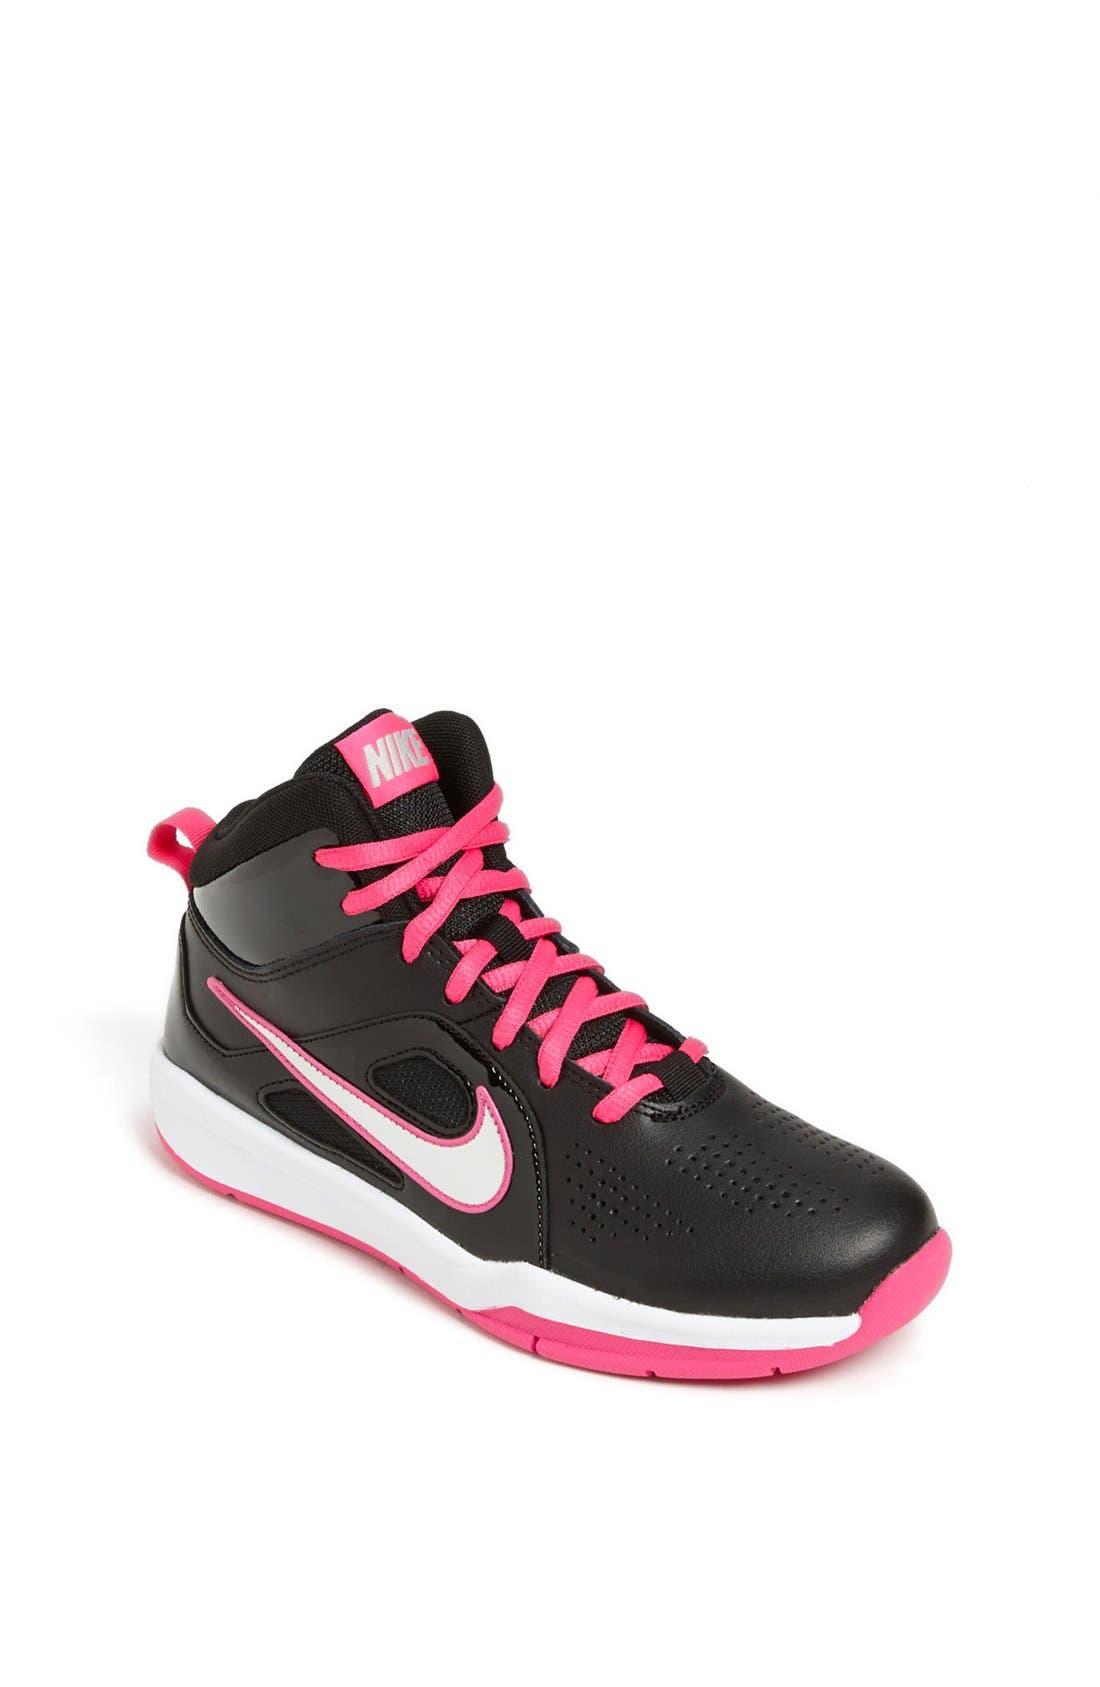 Main Image - Nike 'Team Hustle' Basketball Shoe (Toddler, Little Kid & Big Kid)